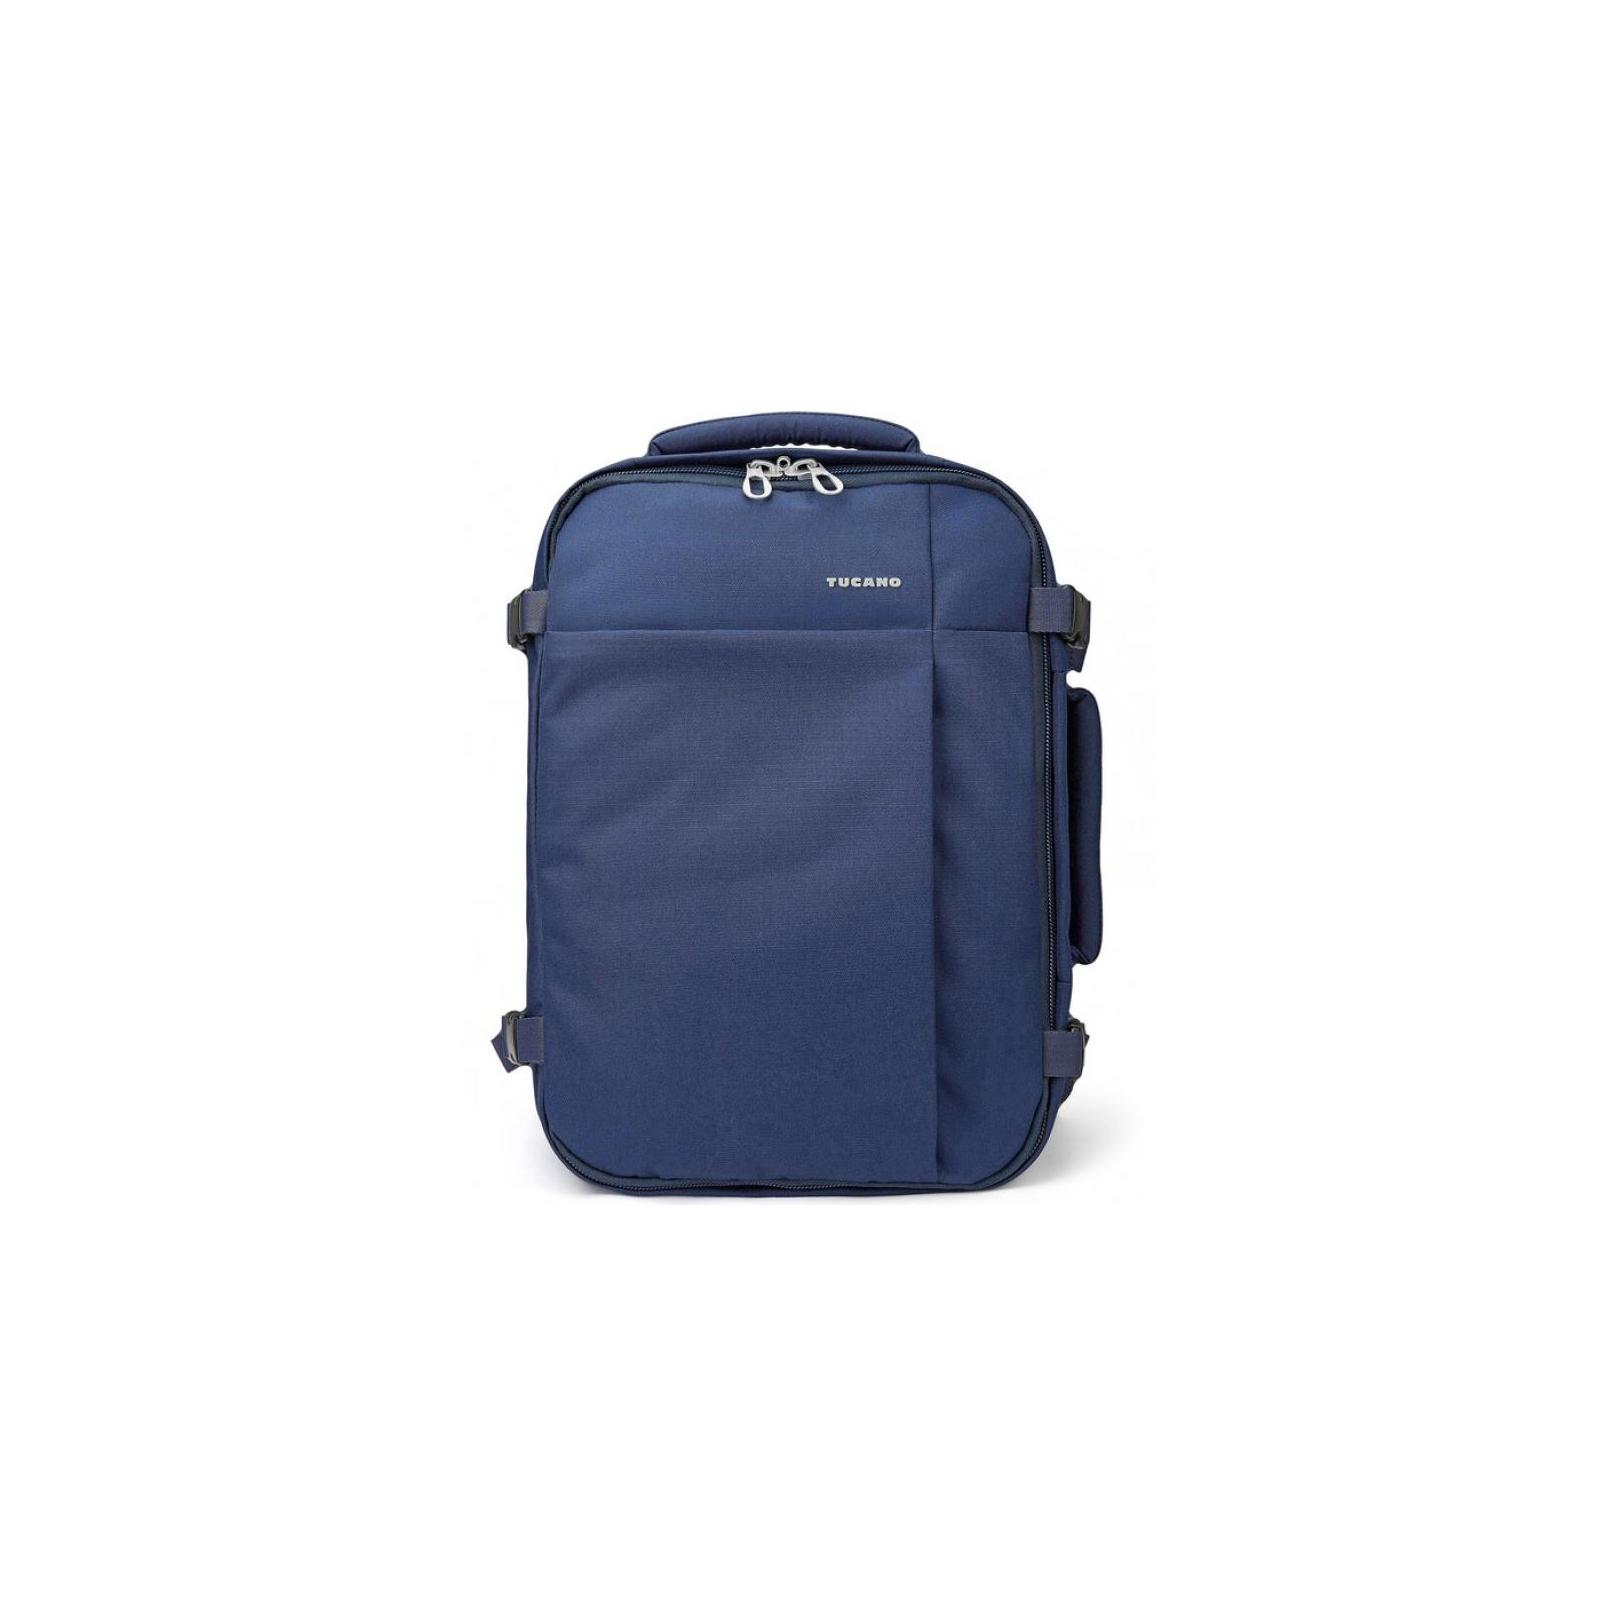 "Рюкзак для ноутбука Tucano 15.6"" TUGO' M CABIN blue (BKTUG-M-B) изображение 2"